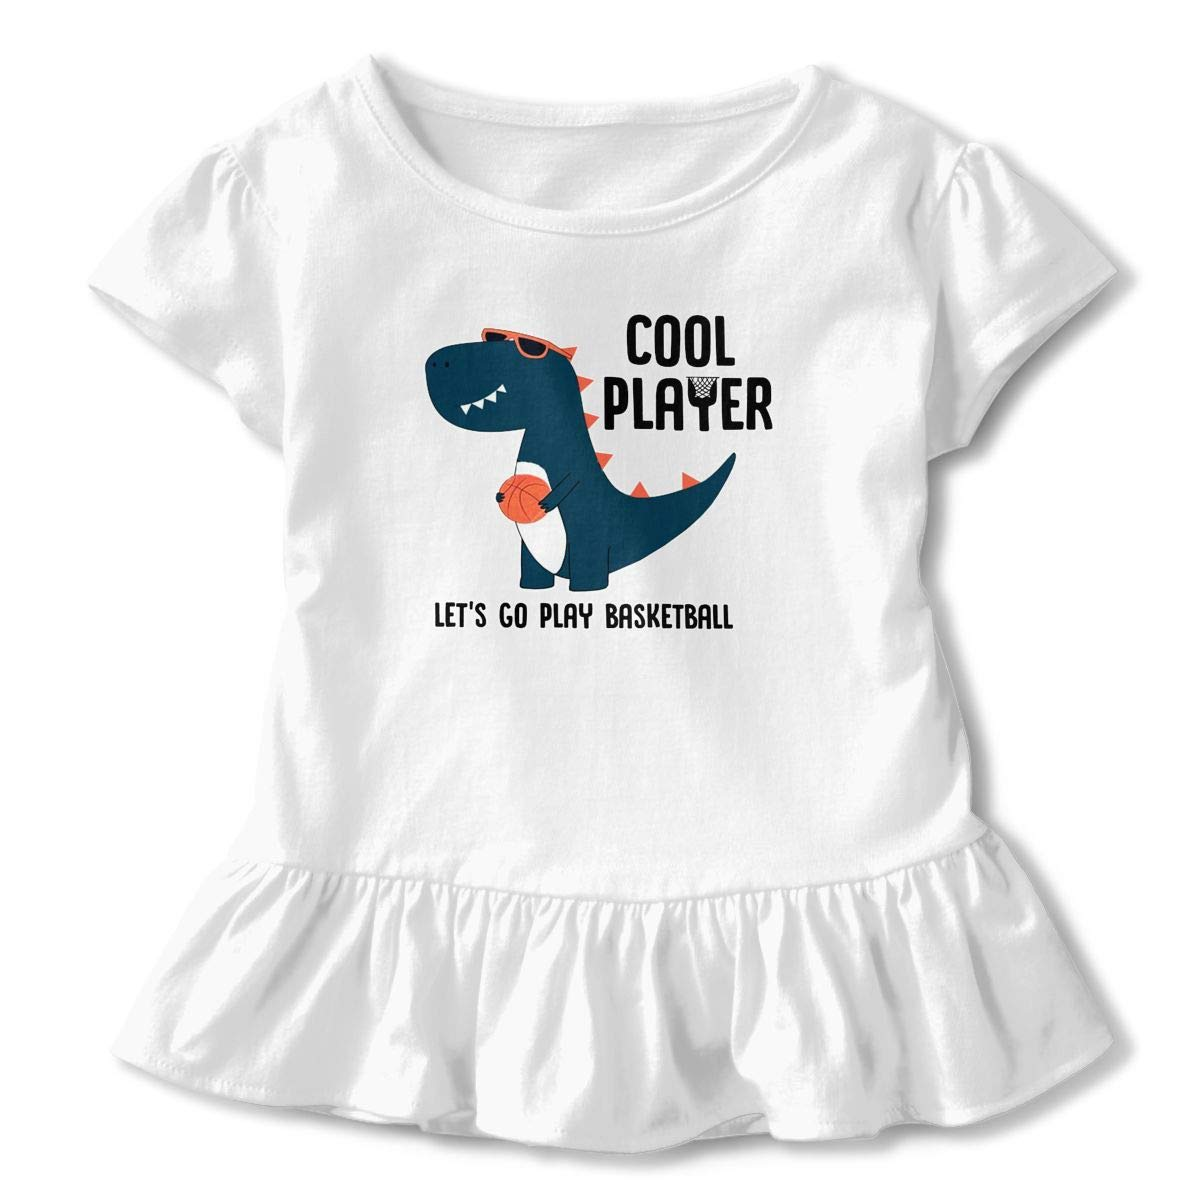 ZP-CCYF Cool Dinosaur Player Toddler Baby Girl Ruffle Short Sleeve T-Shirt Cute Cotton T Shirts